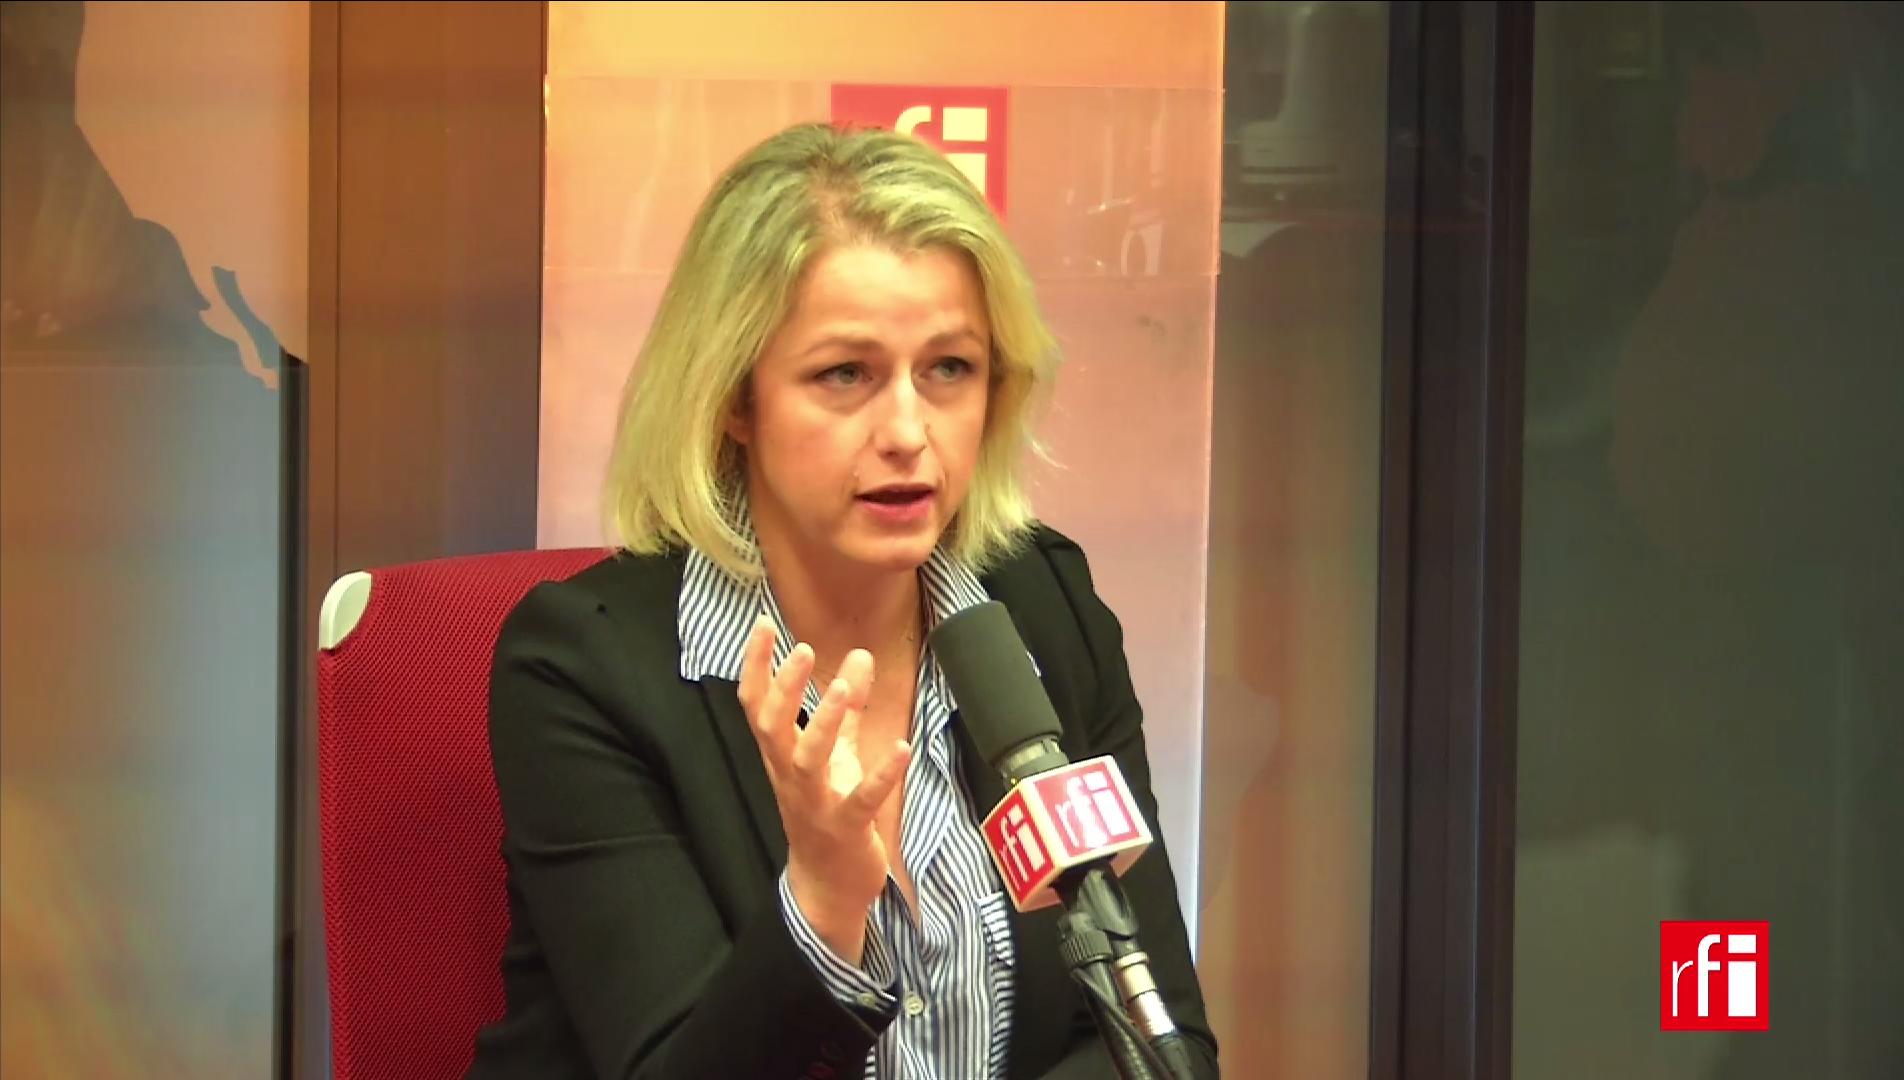 Barbara Pompili défend bec et ongles l'action du gouvernement.